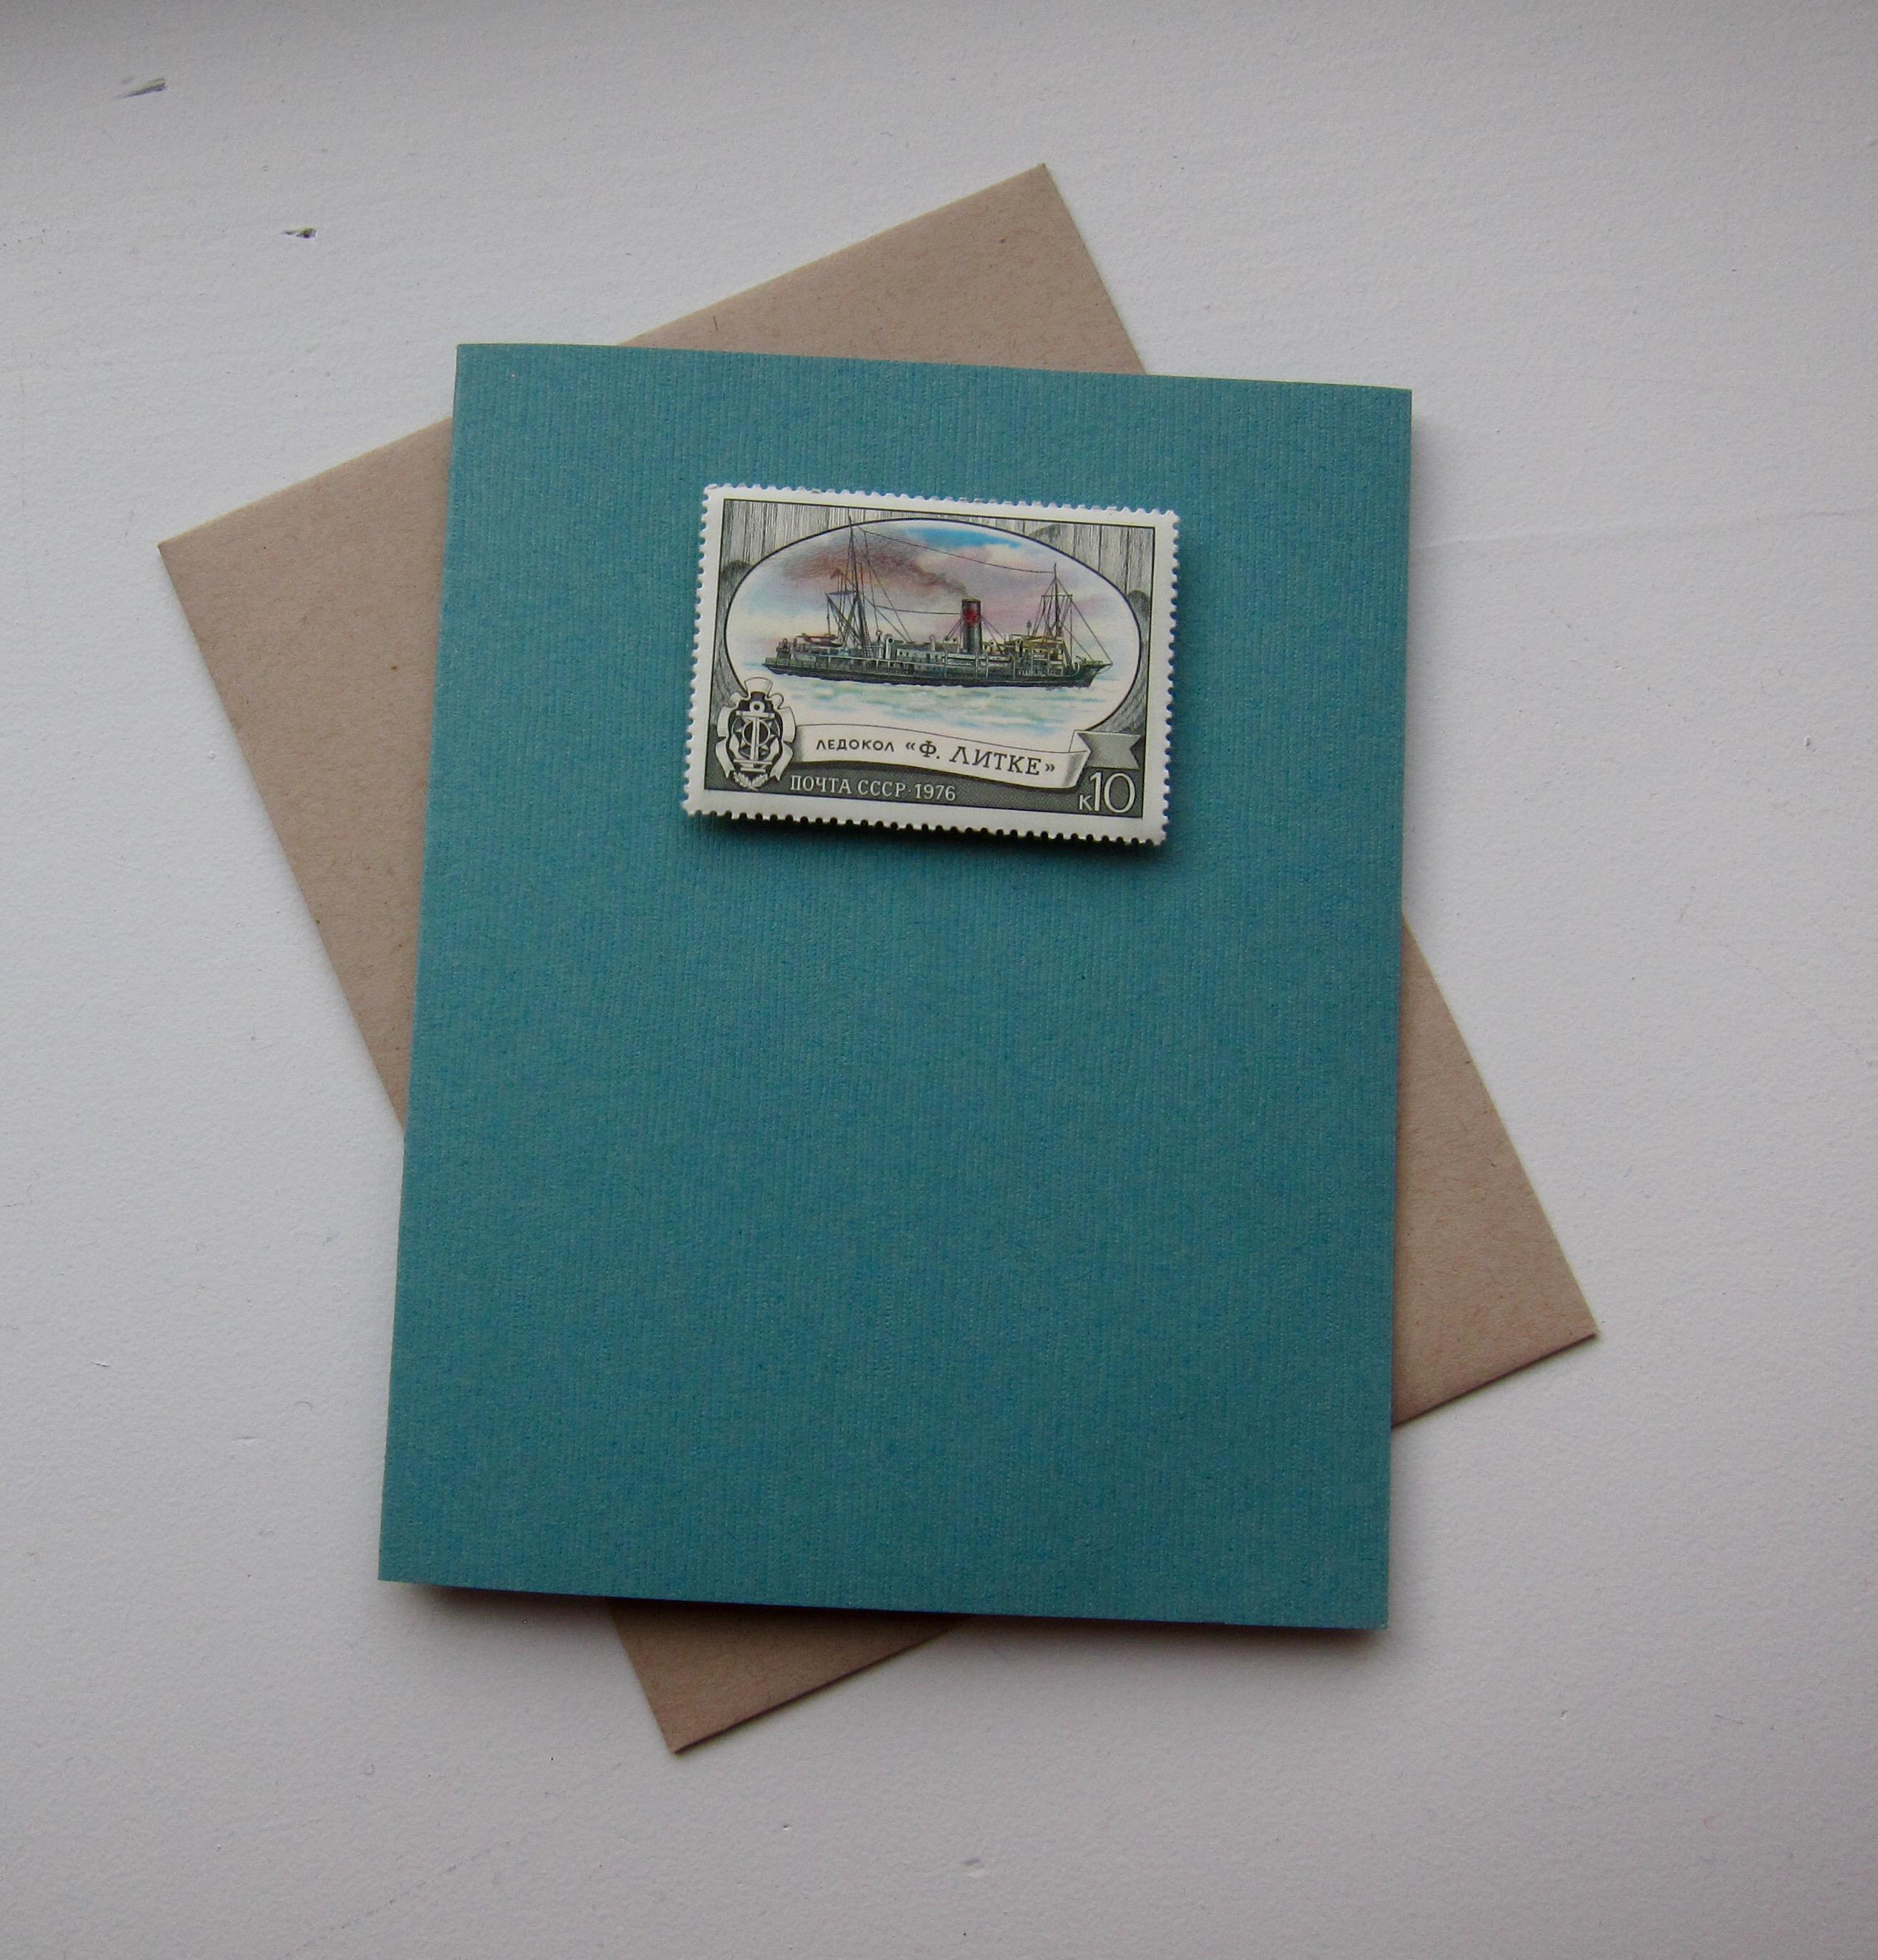 Teal Stamp 2